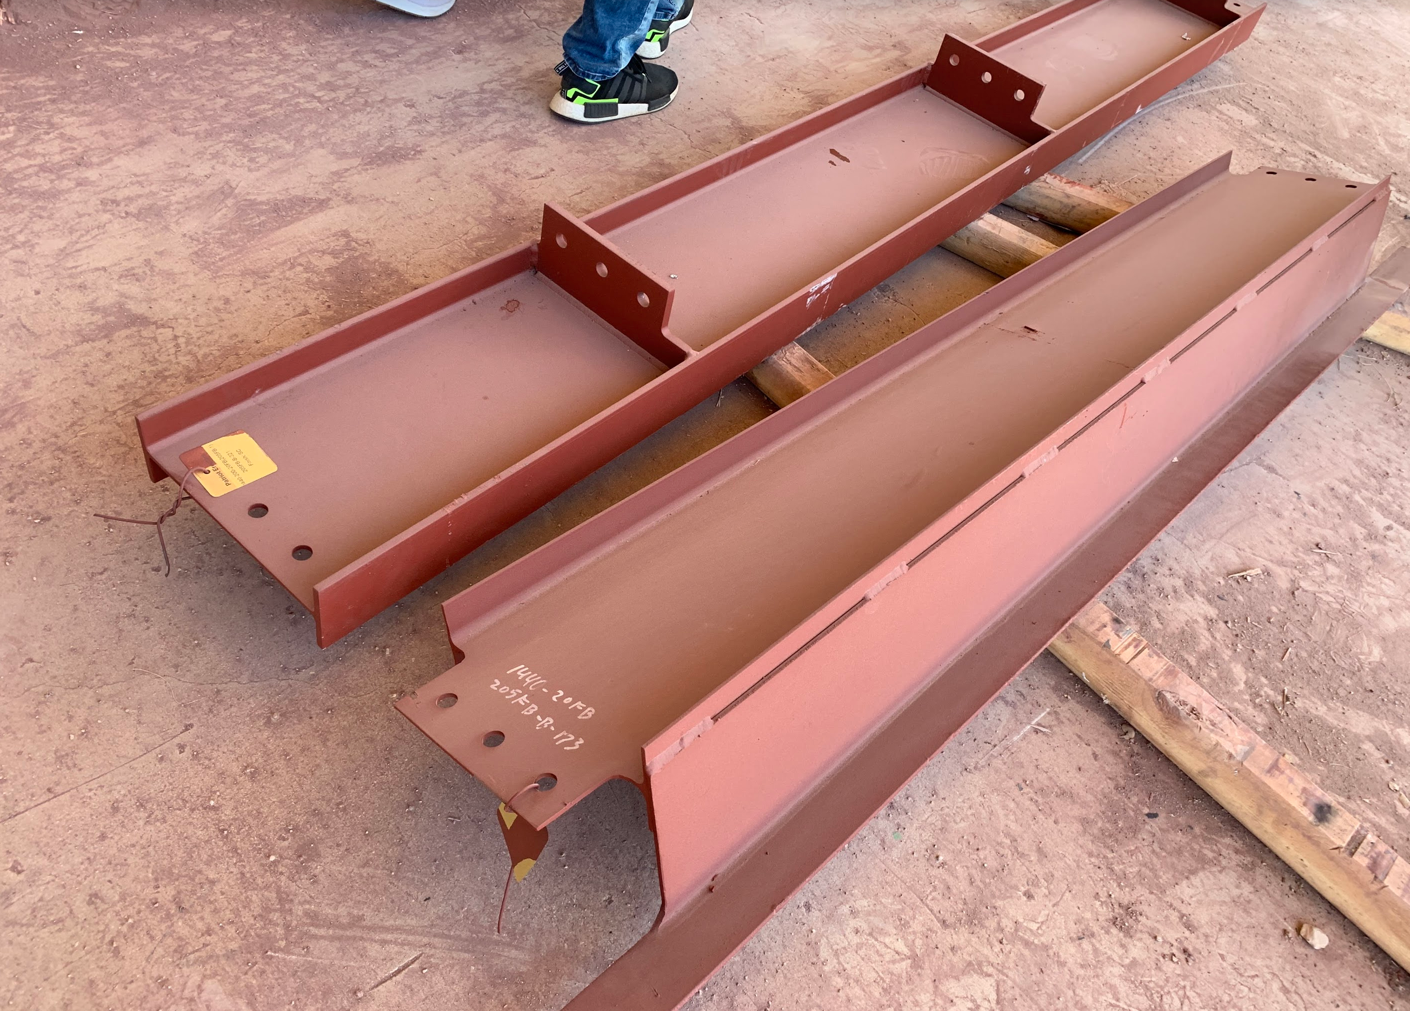 SteelDay 2019 - Structural steel example